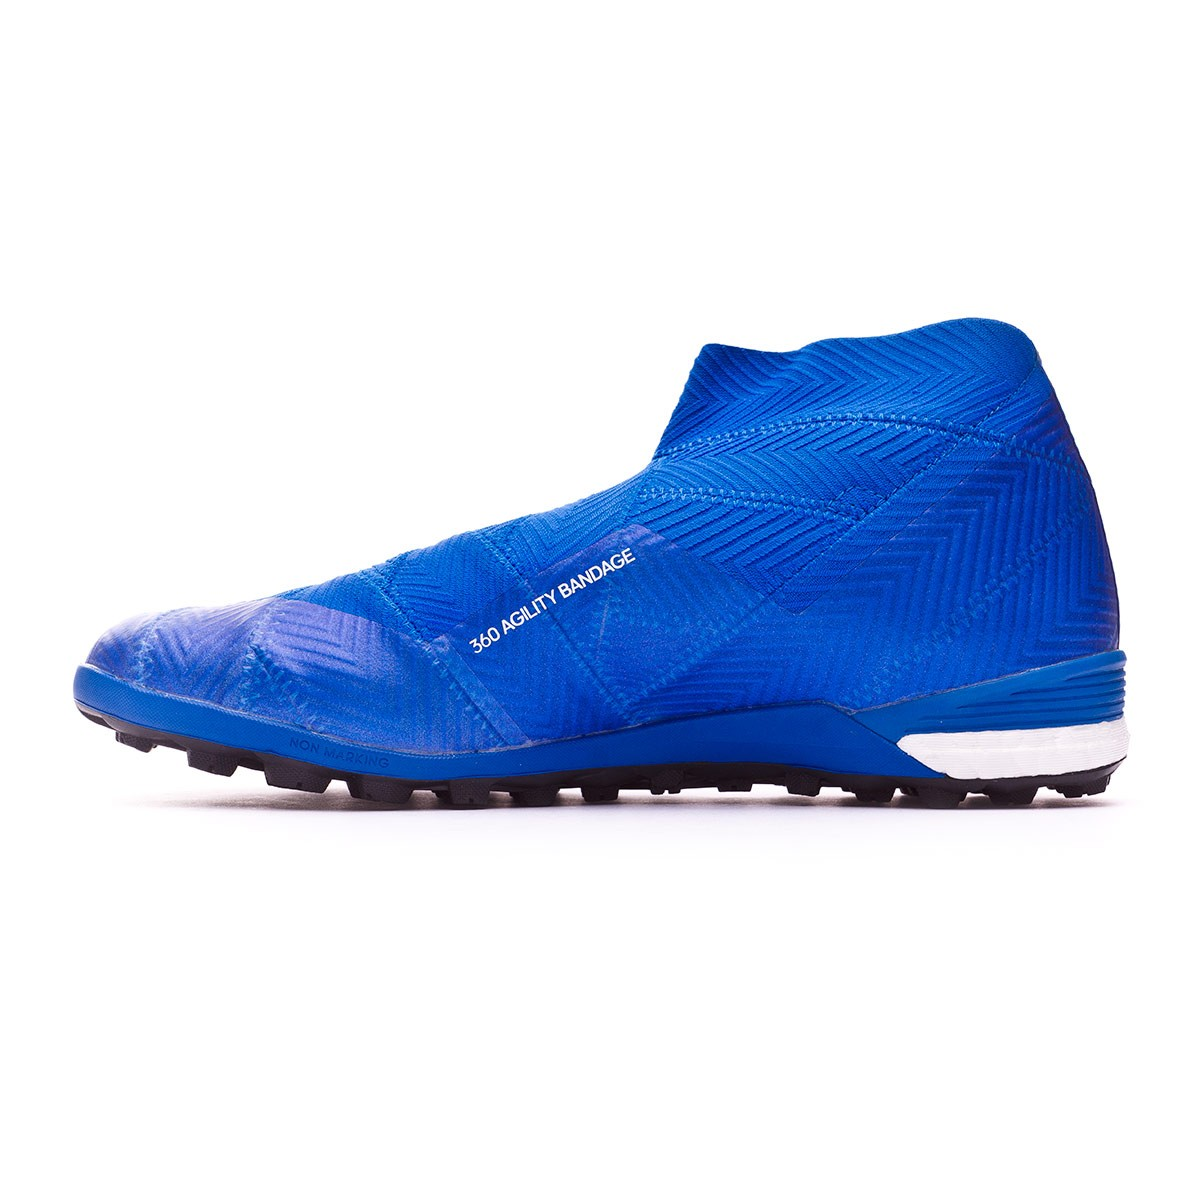 5d062d2622da Football Boot adidas Nemeziz Tango 18+ Turf Football blue-White - Leaked  soccer